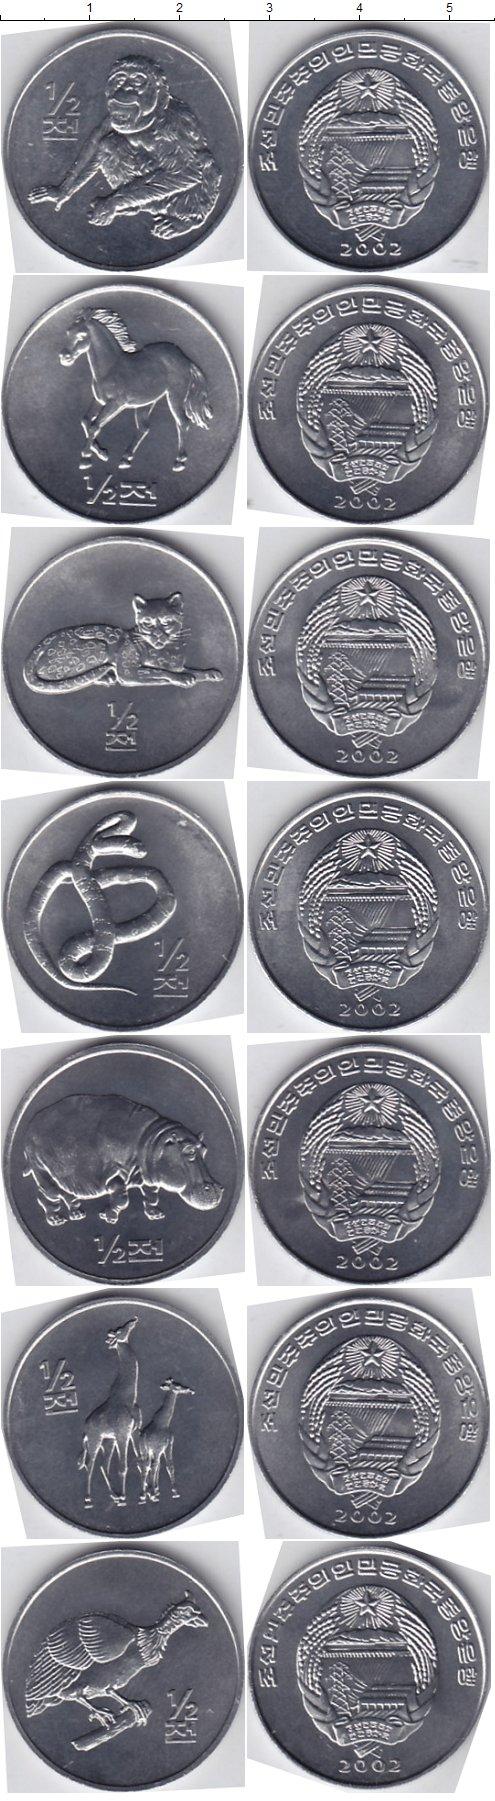 Картинка Наборы монет Северная Корея Северная Корея 2002  2002